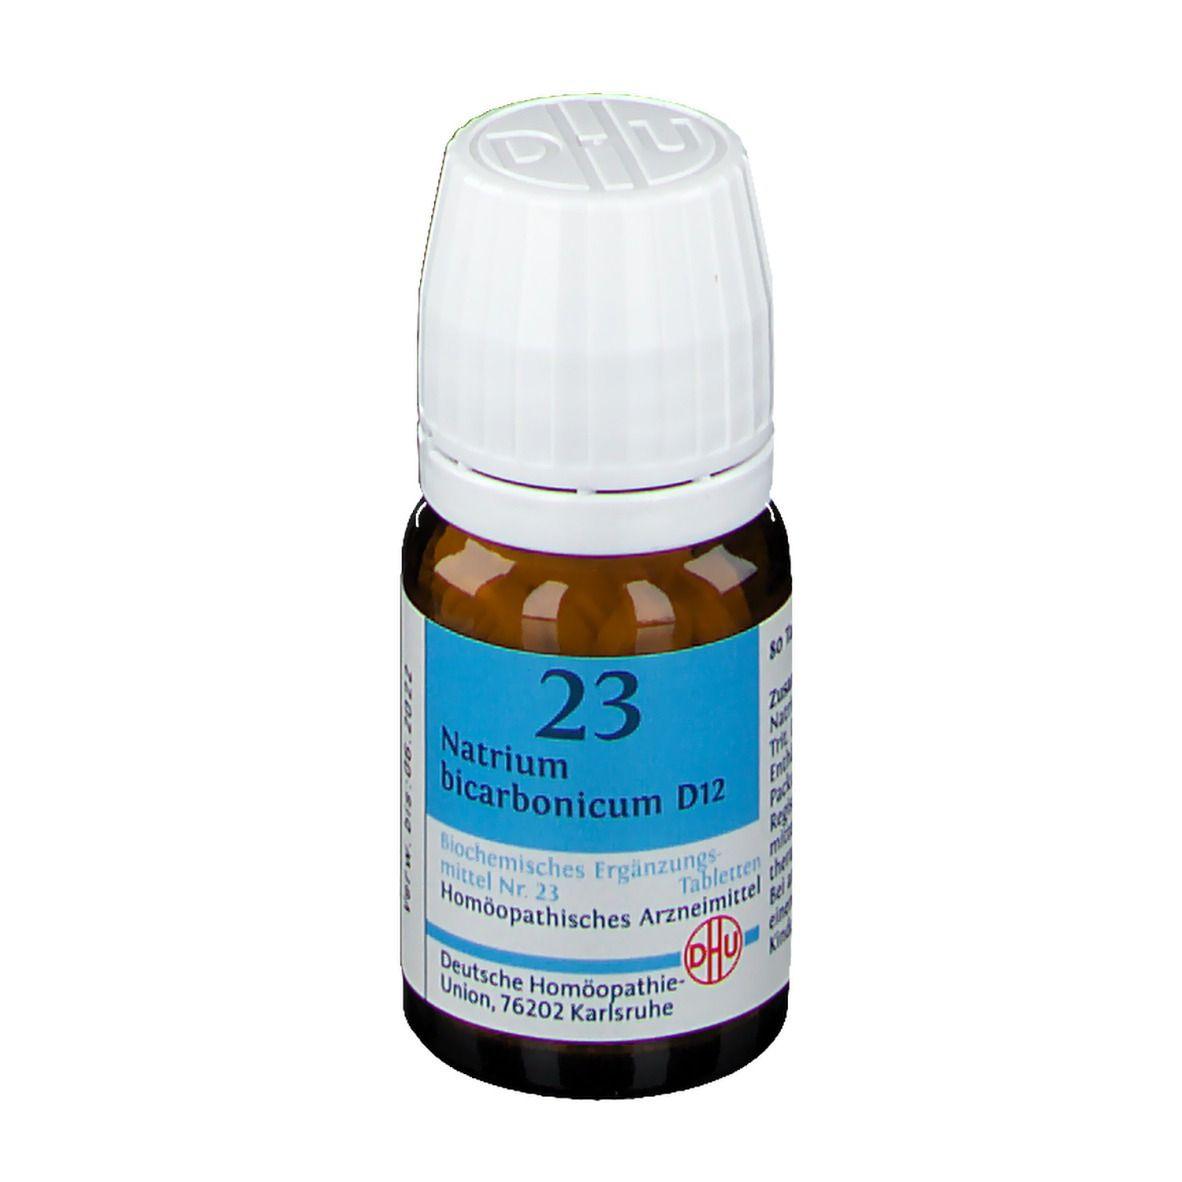 DHU Biochemie 23 Natrium bicarbonicum D12